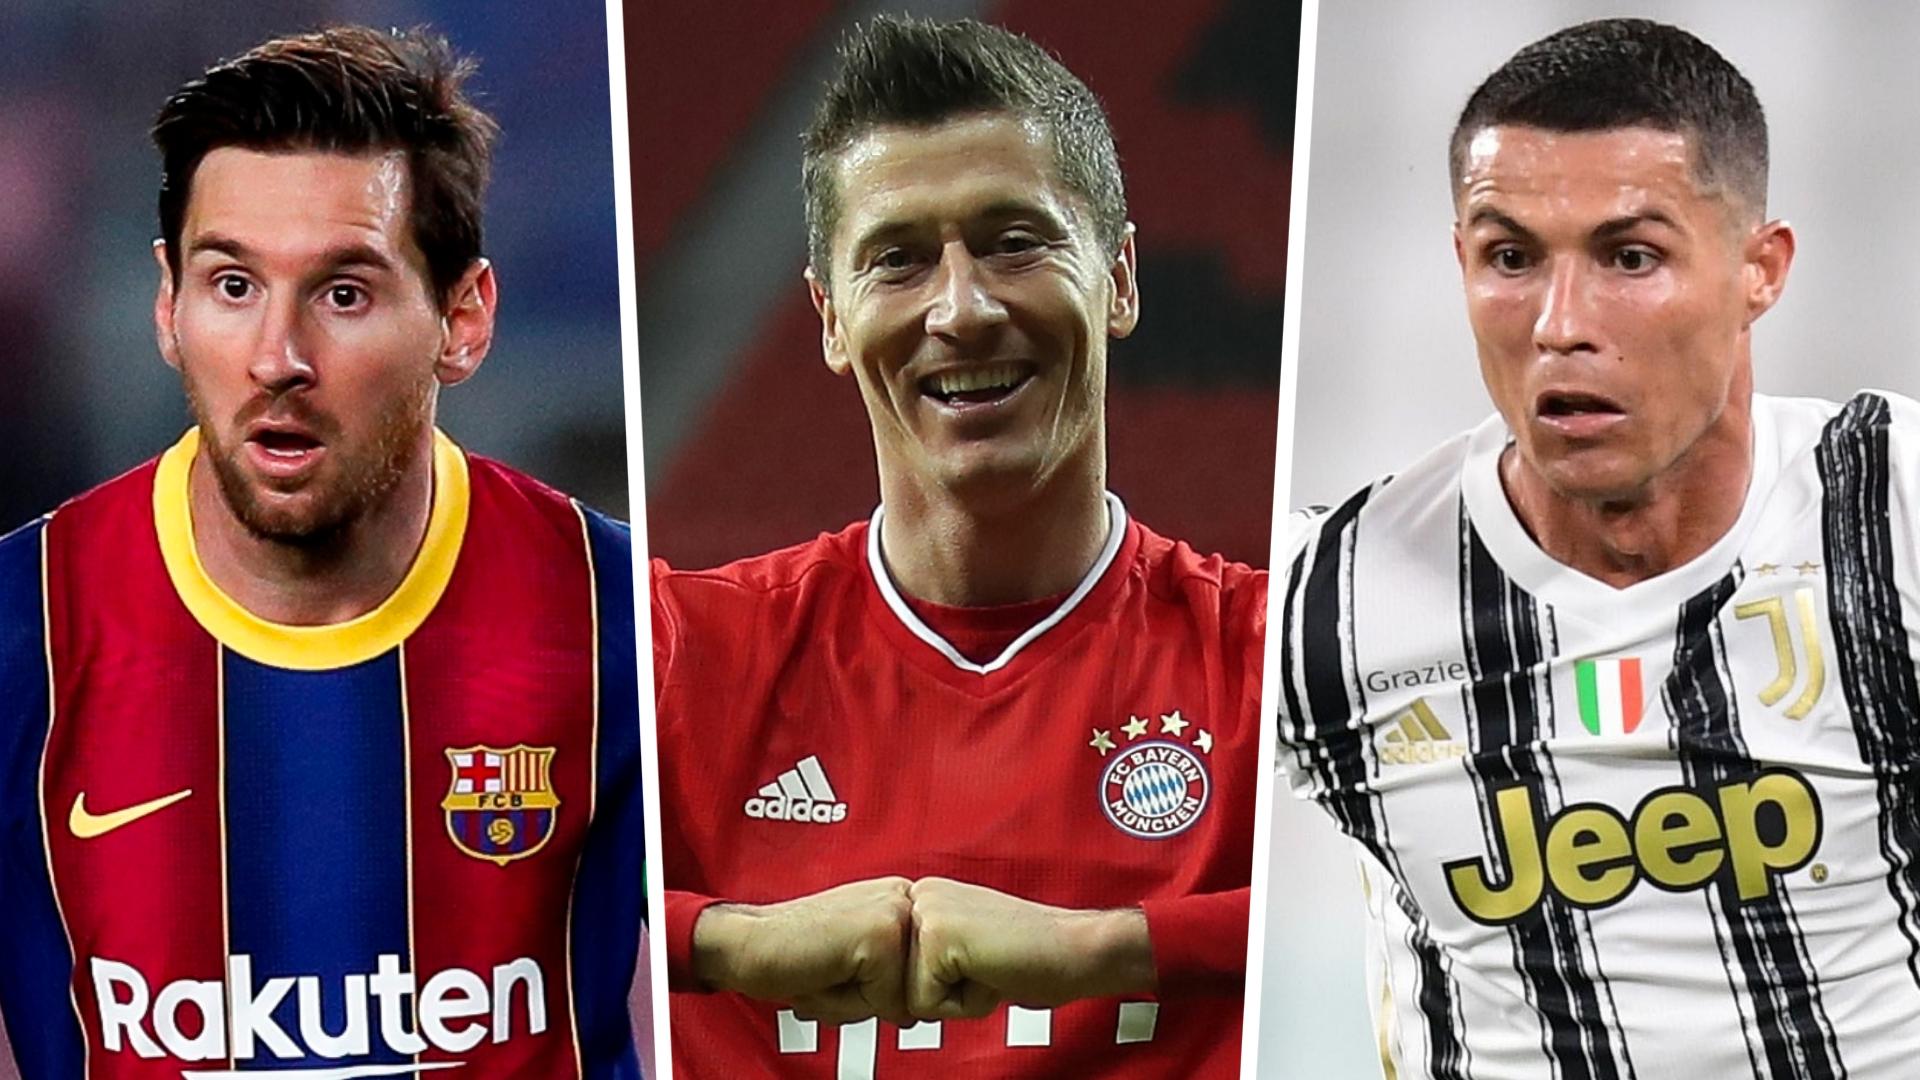 FIFA 21 Team of the Year: Ronaldo & Lewandowski headline as Messi misses out